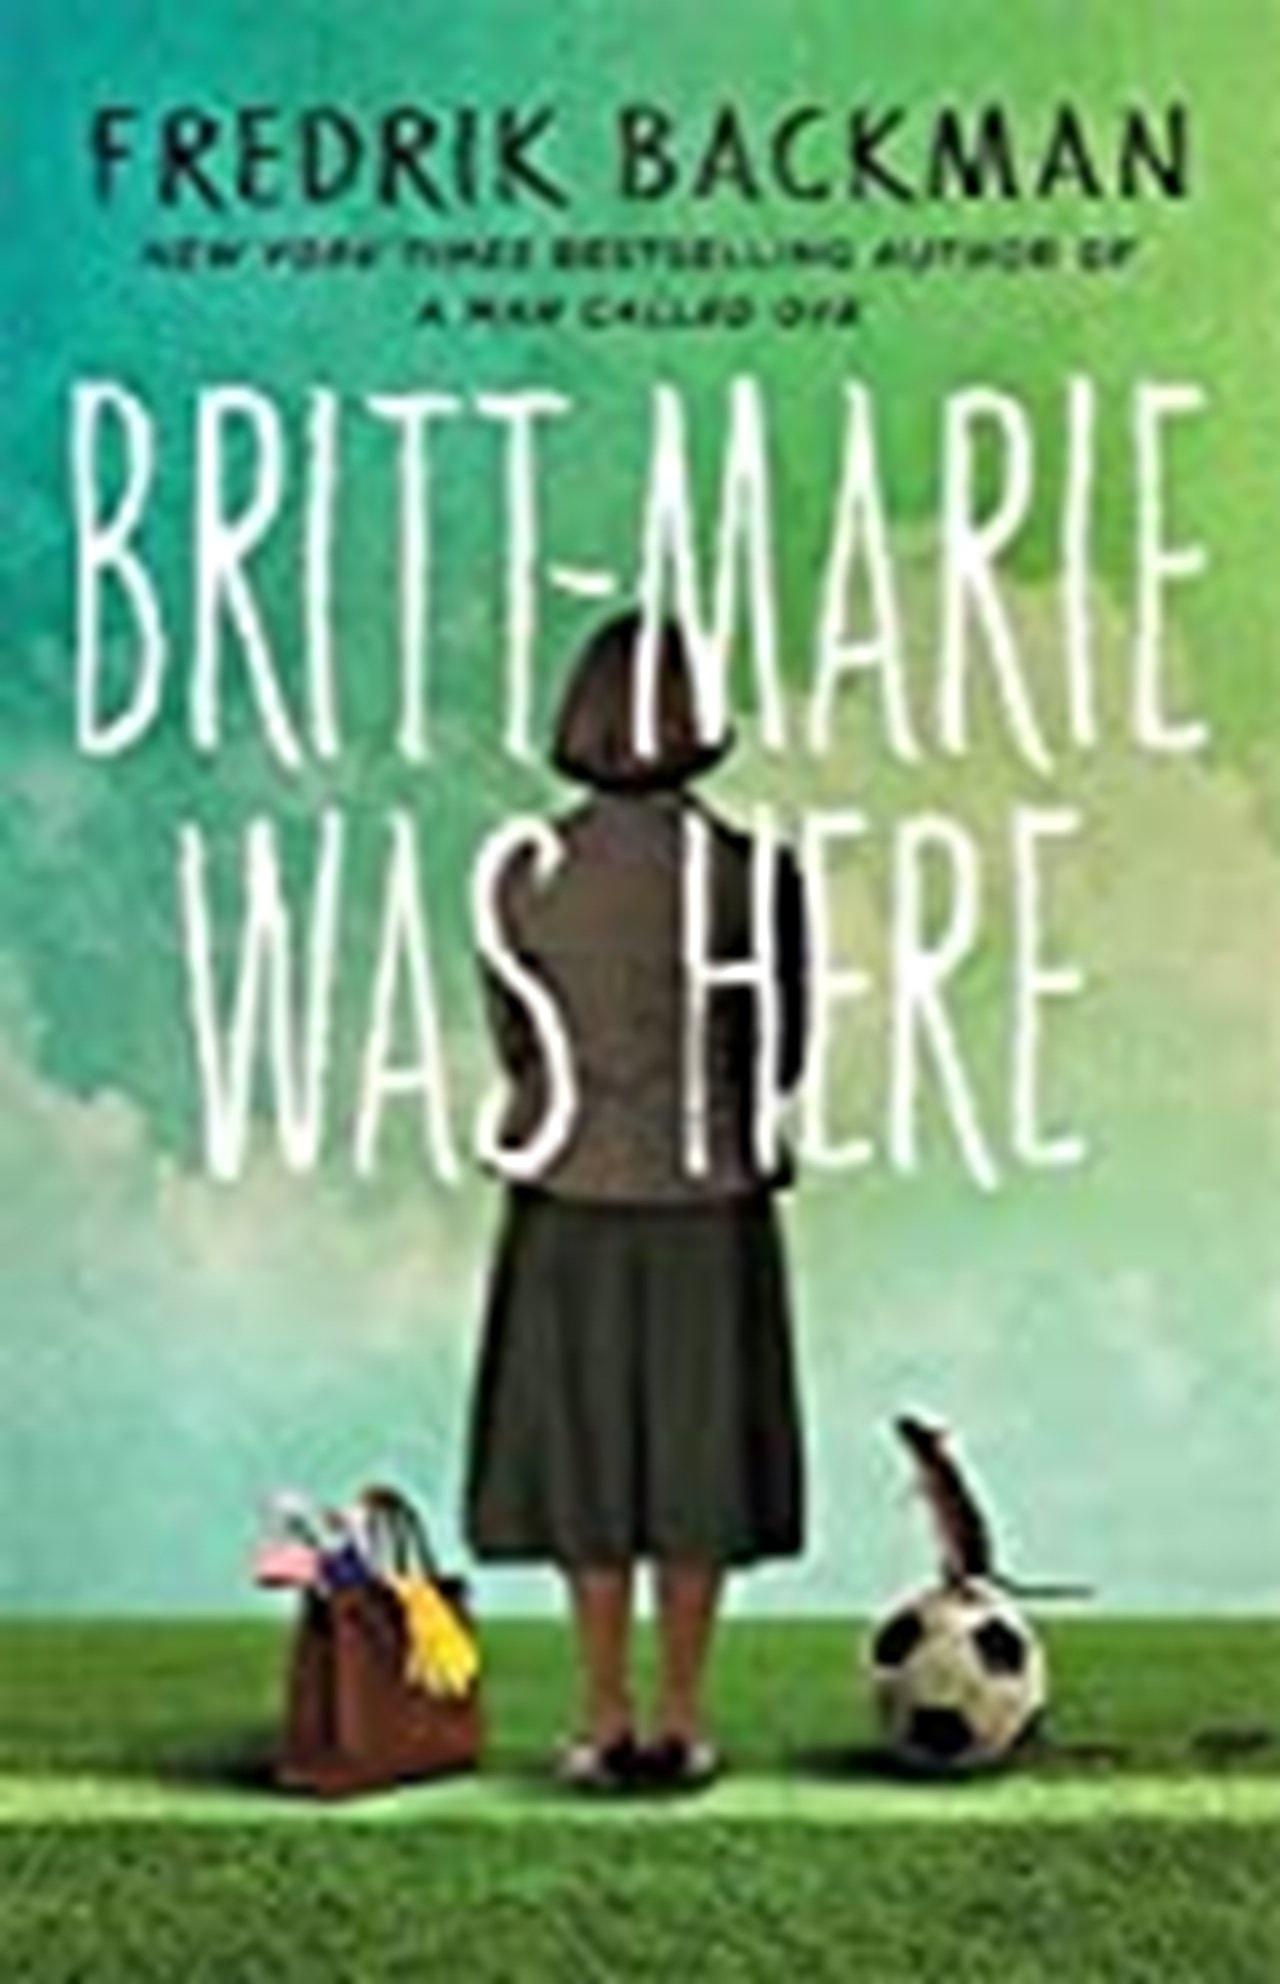 Britt-Marie Was Here - 1